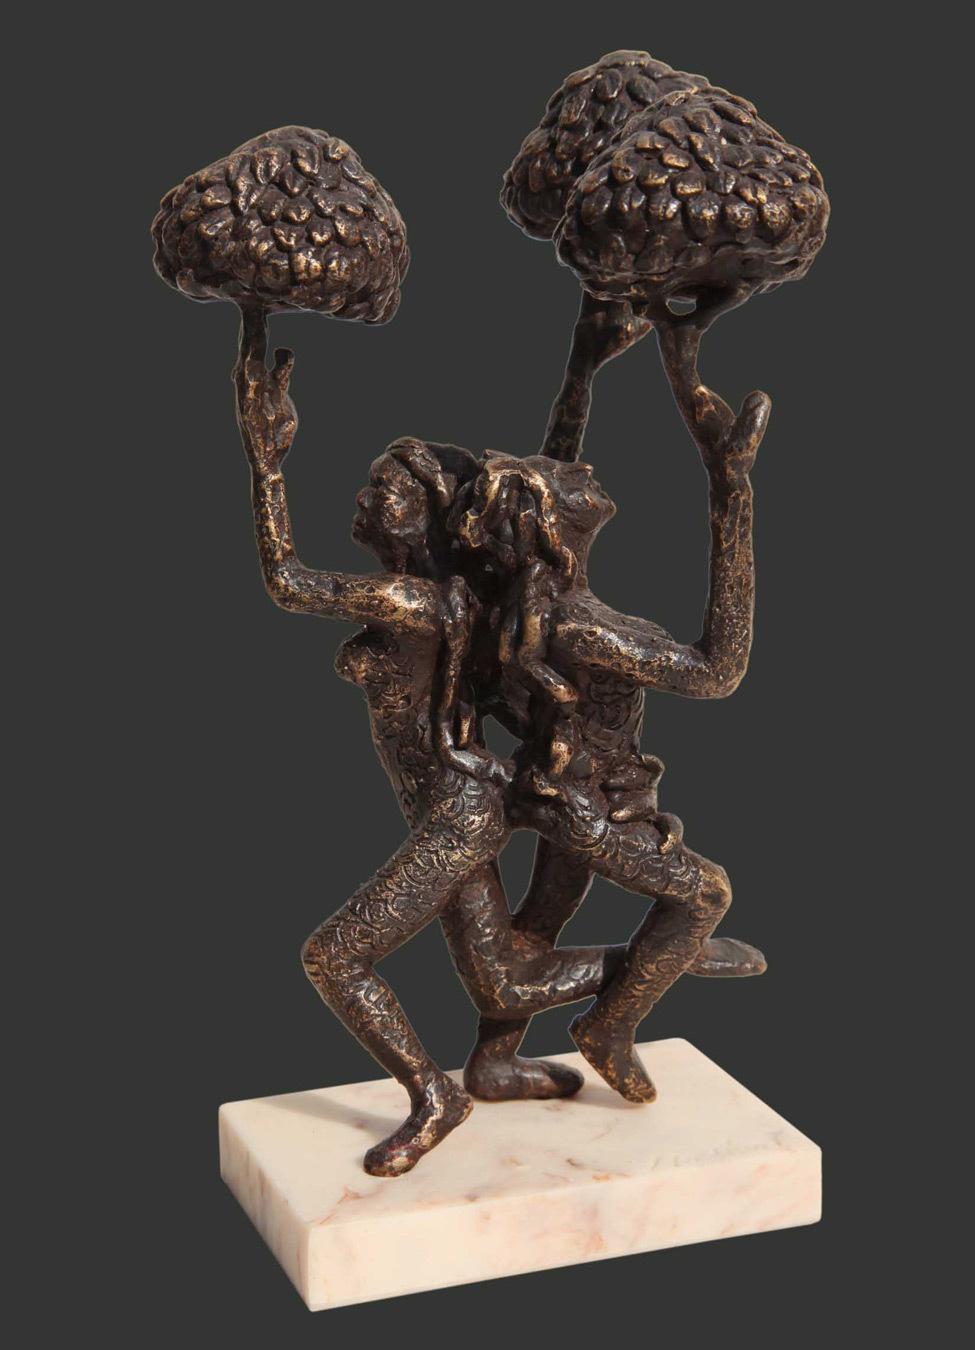 H8.5xl5.5xw4.5''inches bronze sculpture 2018 a420c